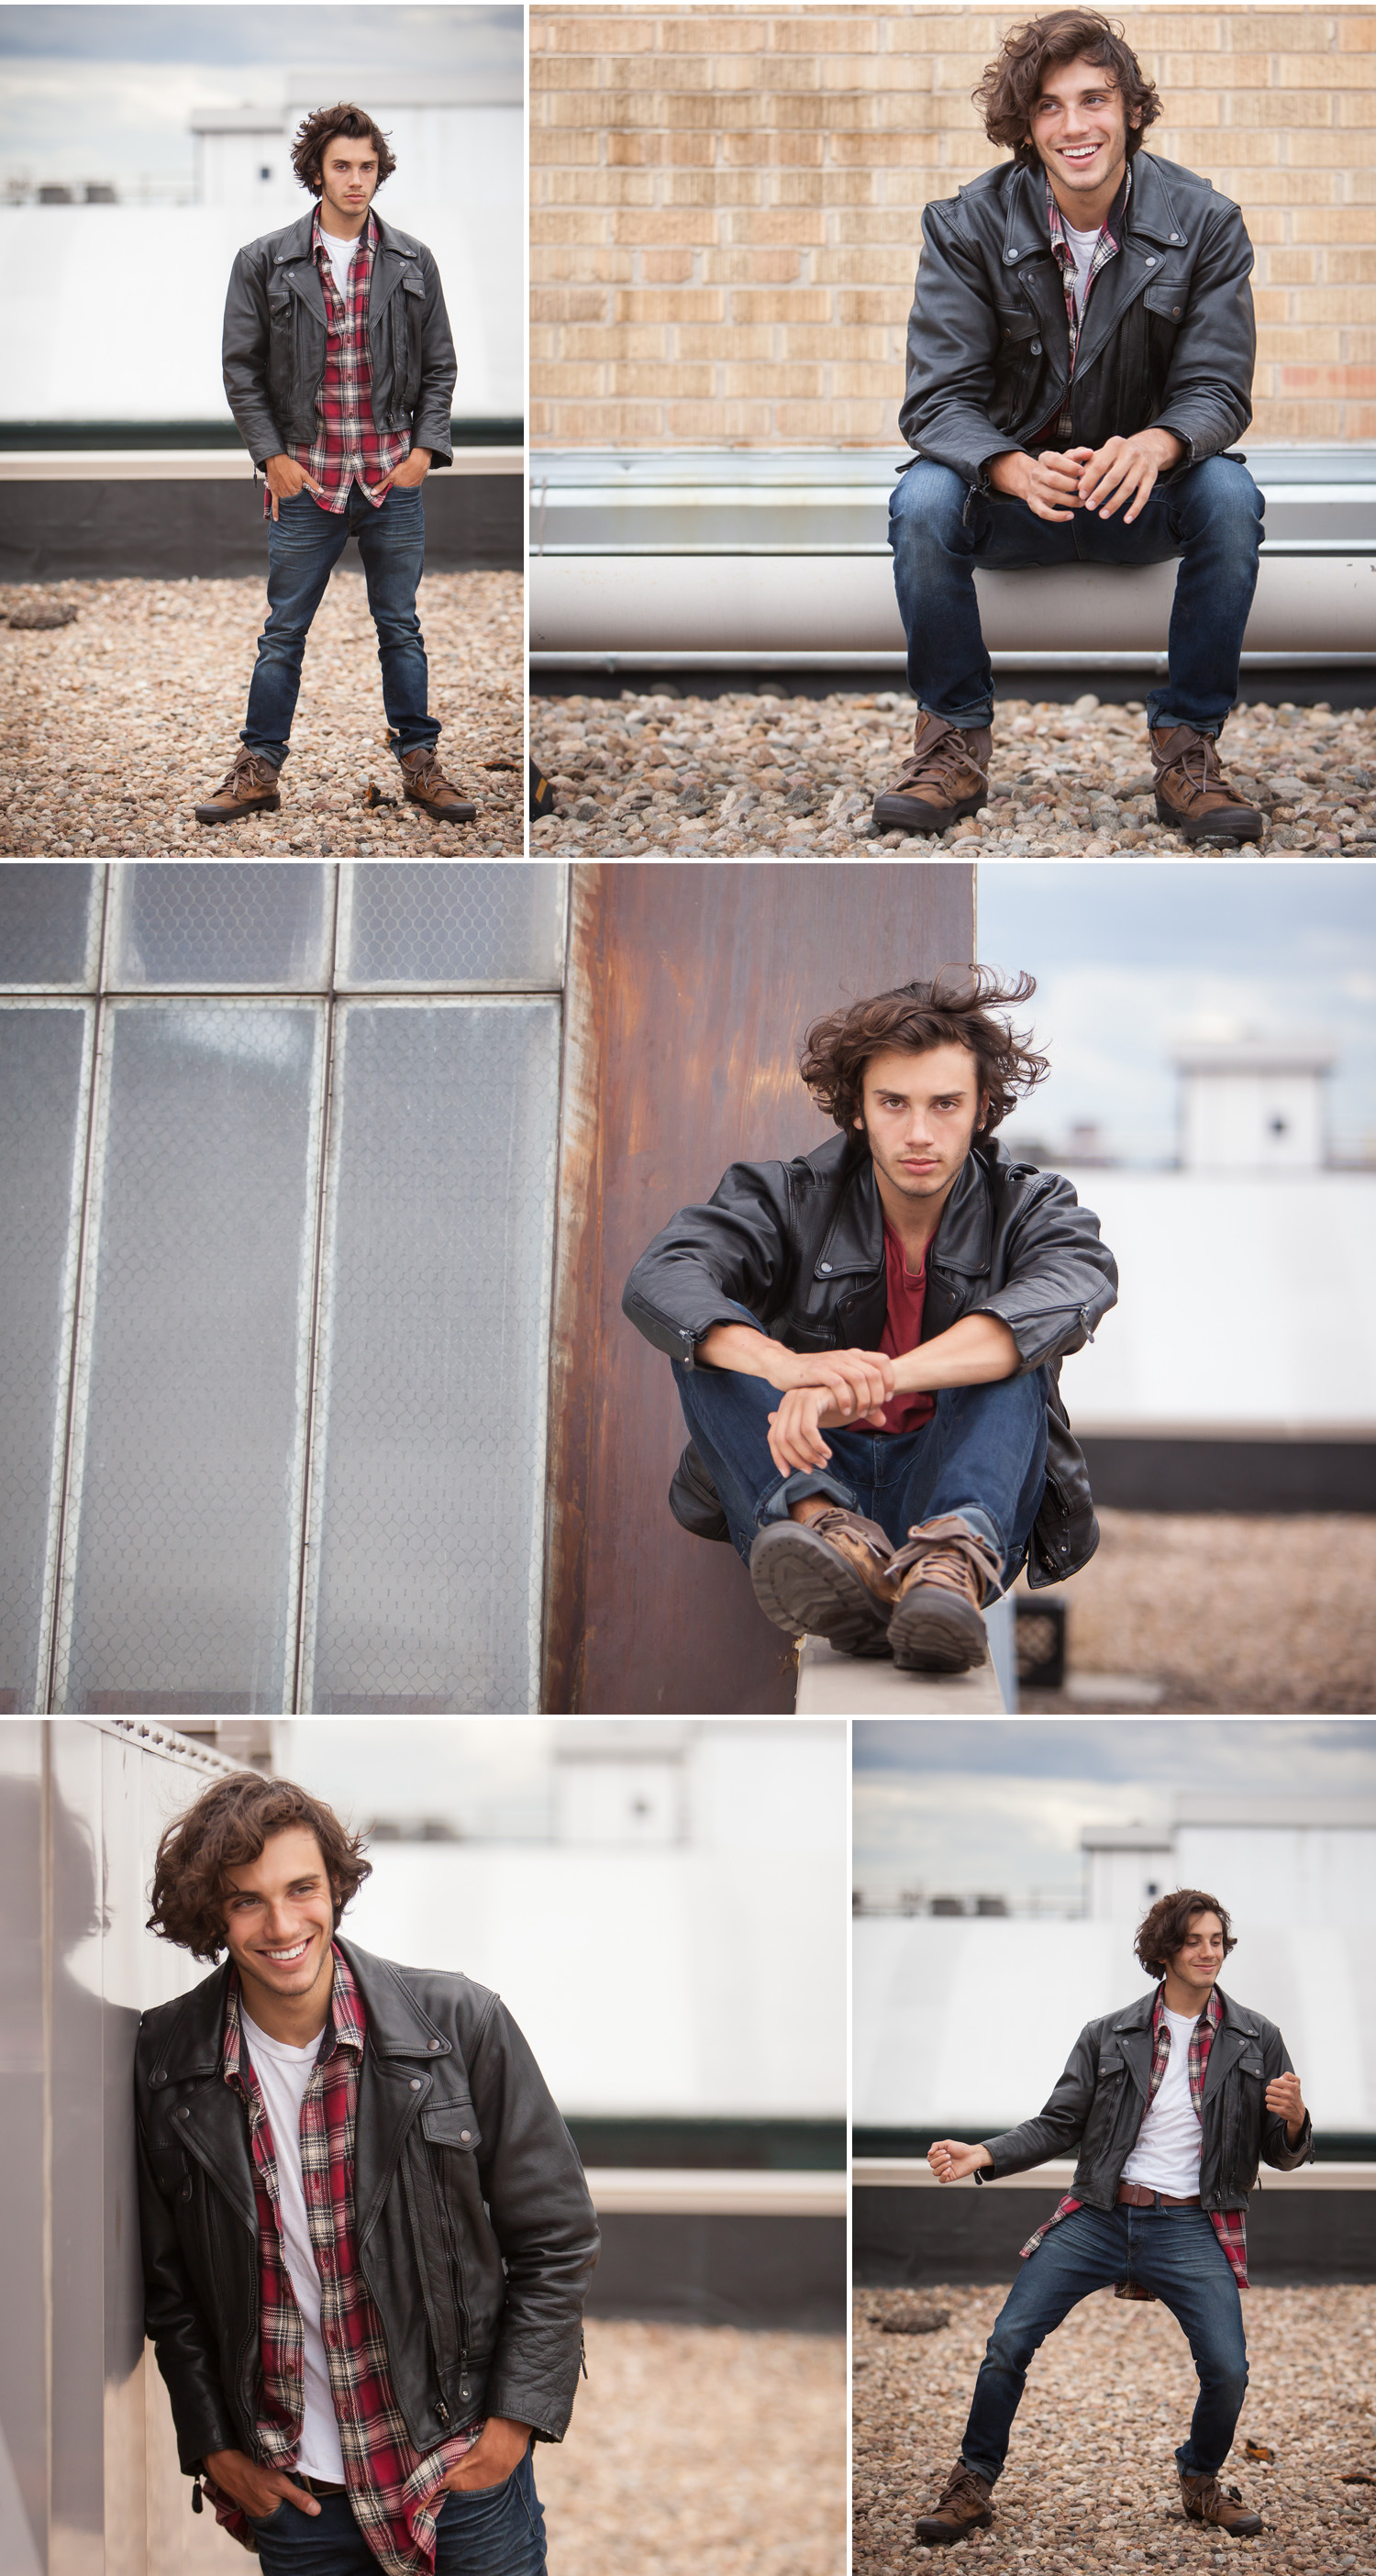 Male Talent Headshots and Portfolio Photos on urban rooftop, by Denver Photographer Jennifer Koskinen, Merritt Portrait Studio.